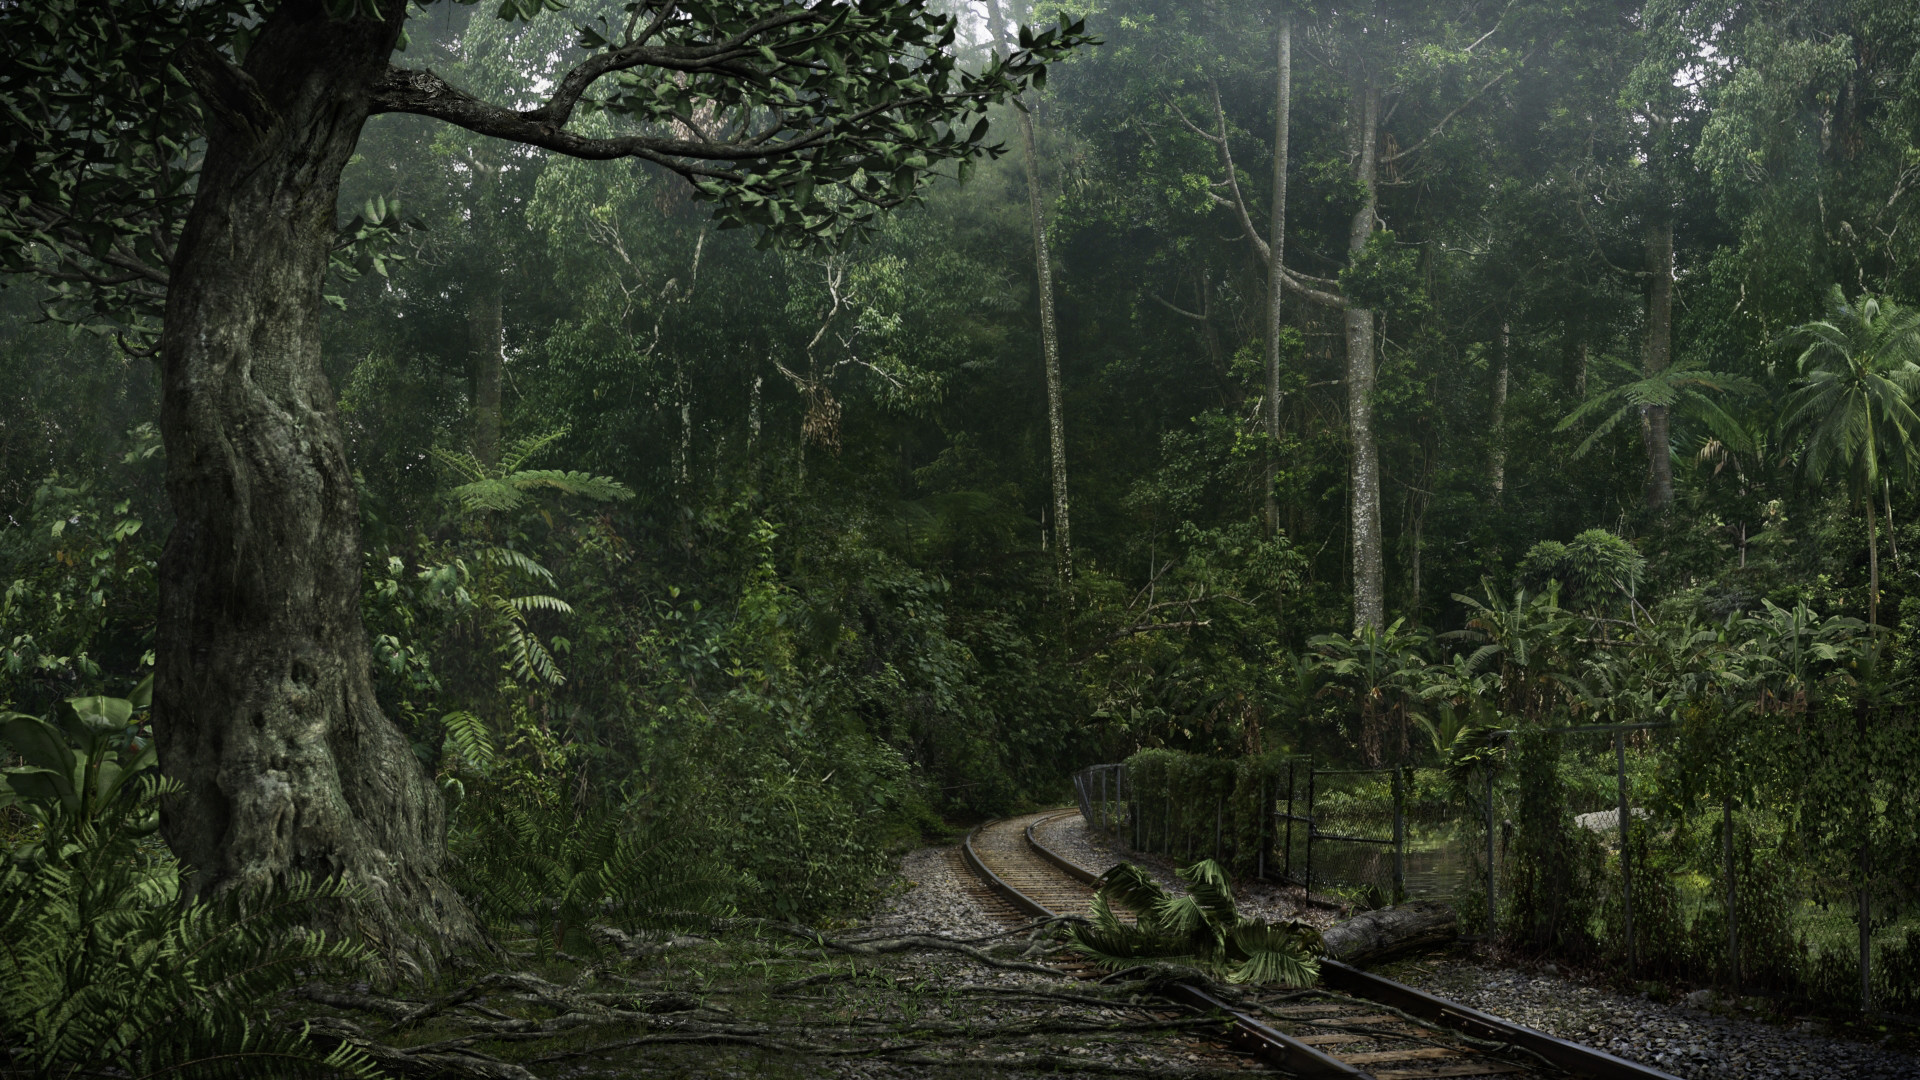 Tamas csordas forest